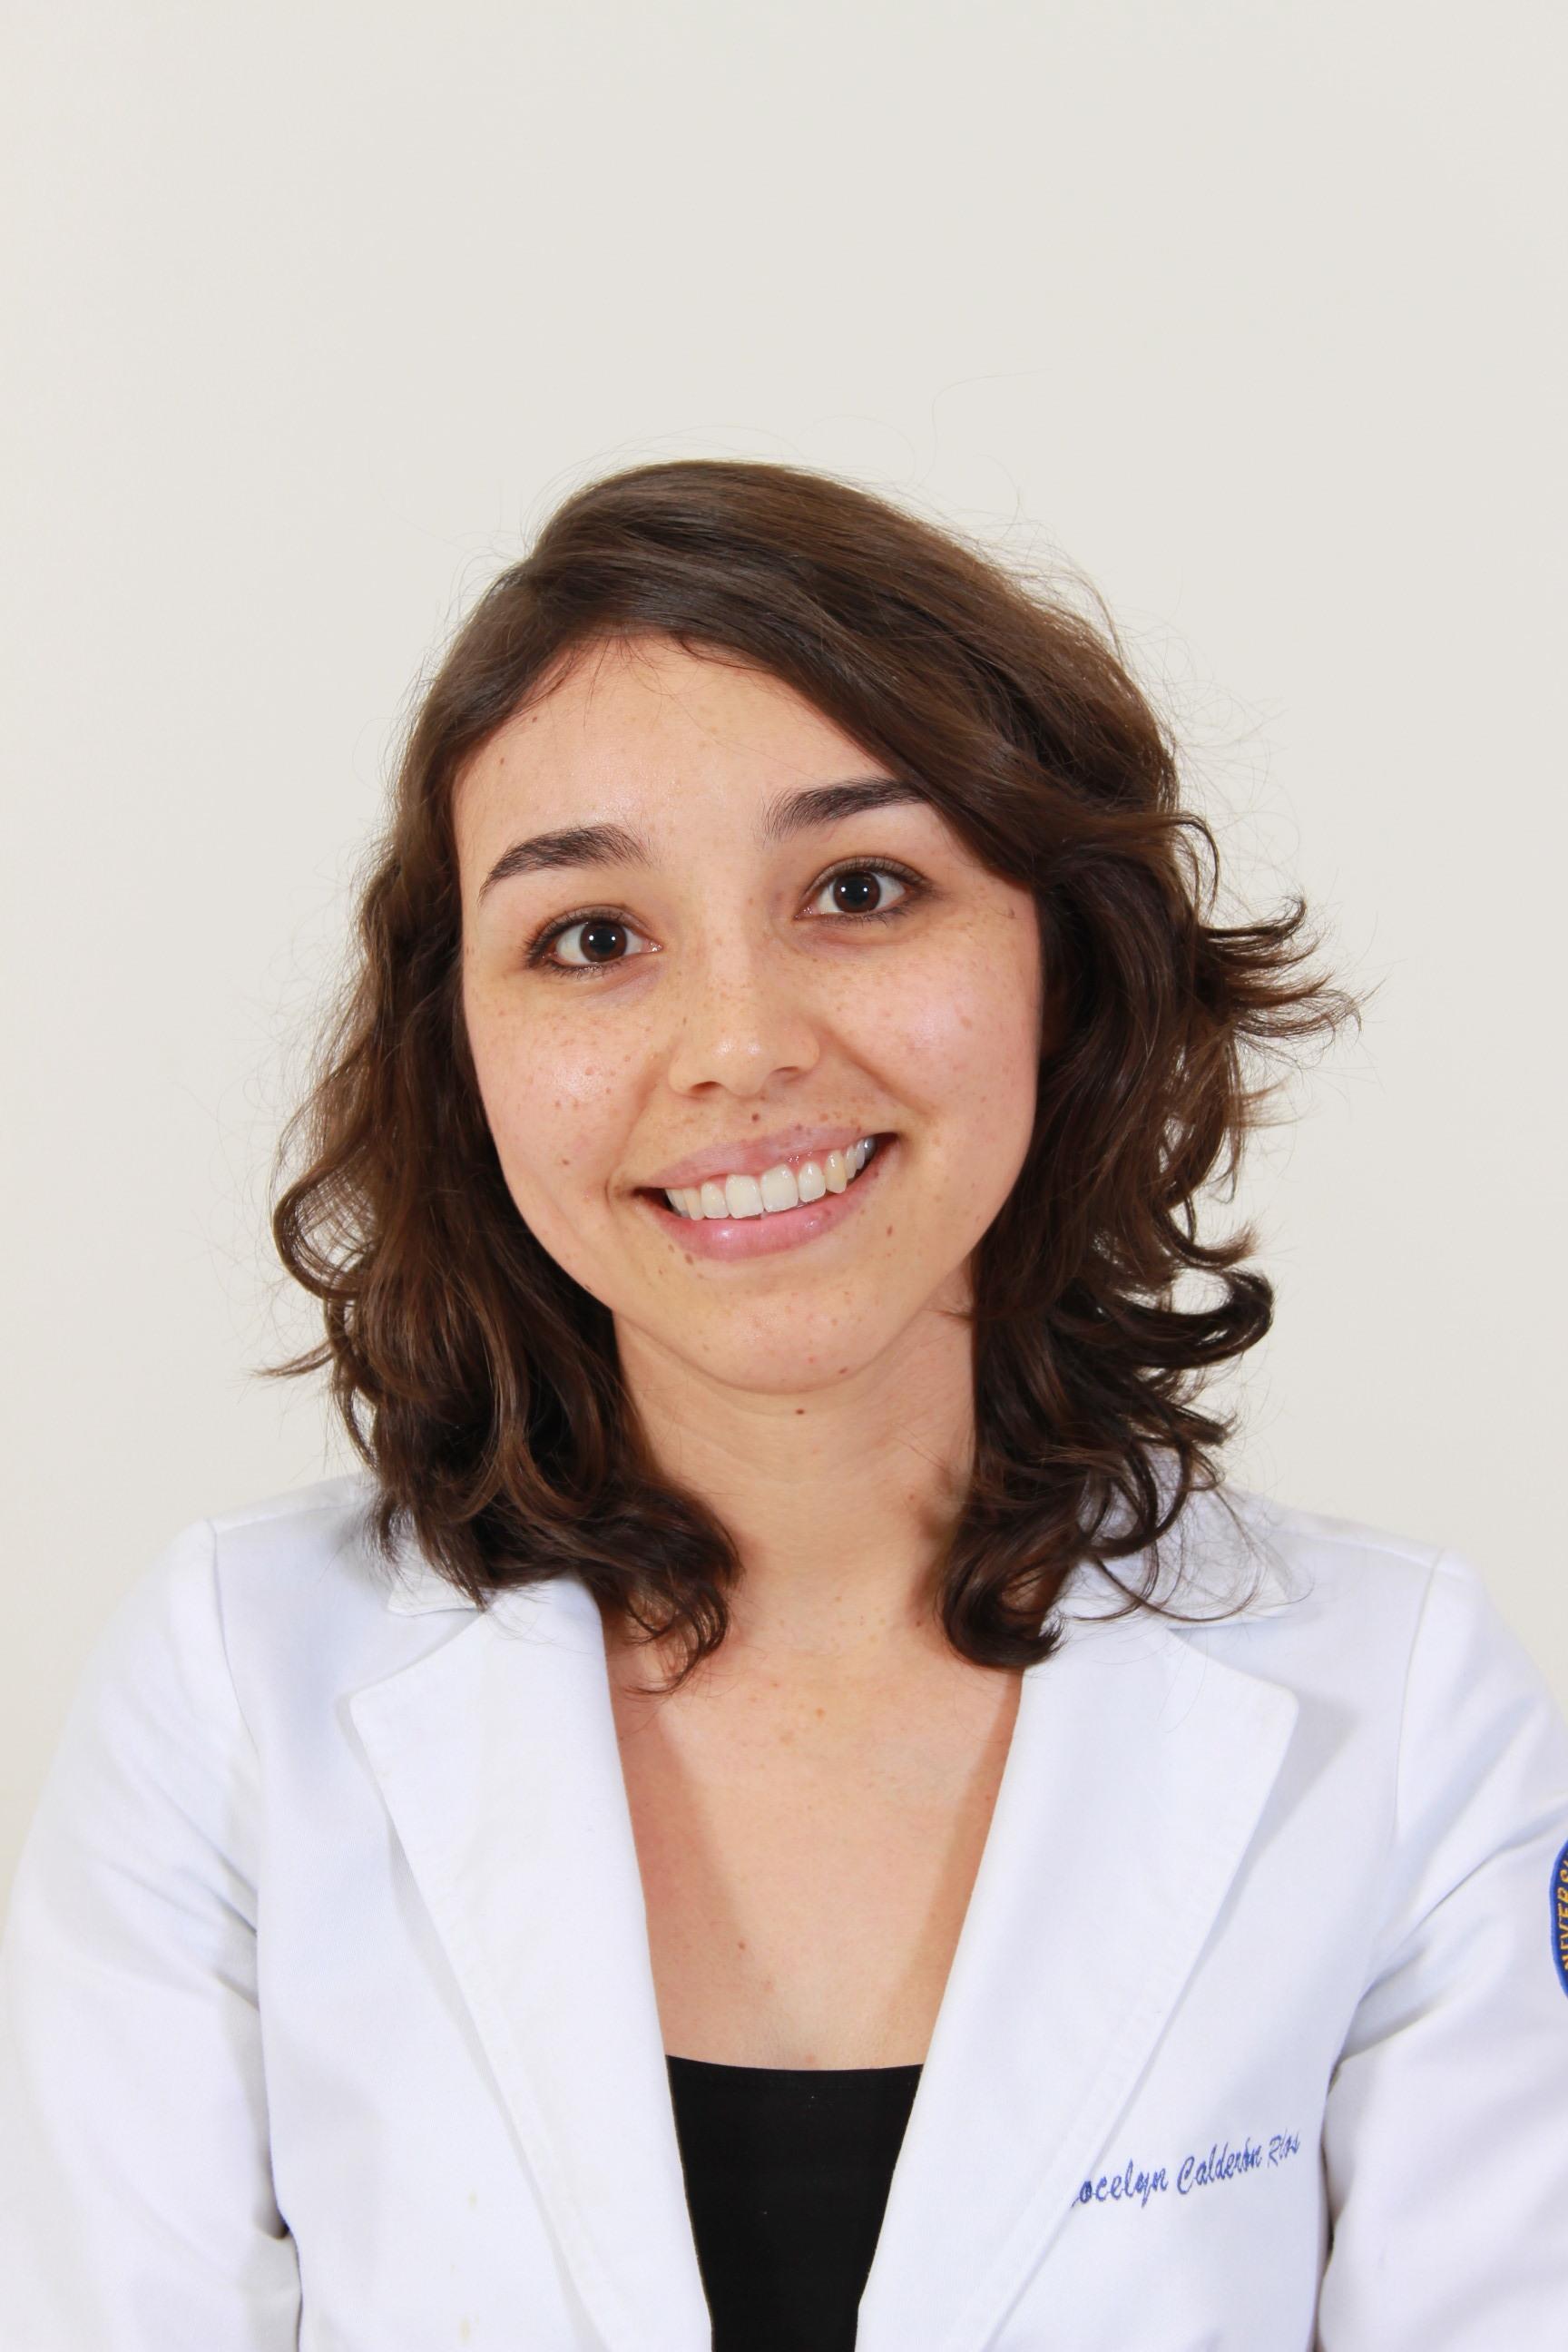 Jocely Calderon Ophthalmology Resident.JPG